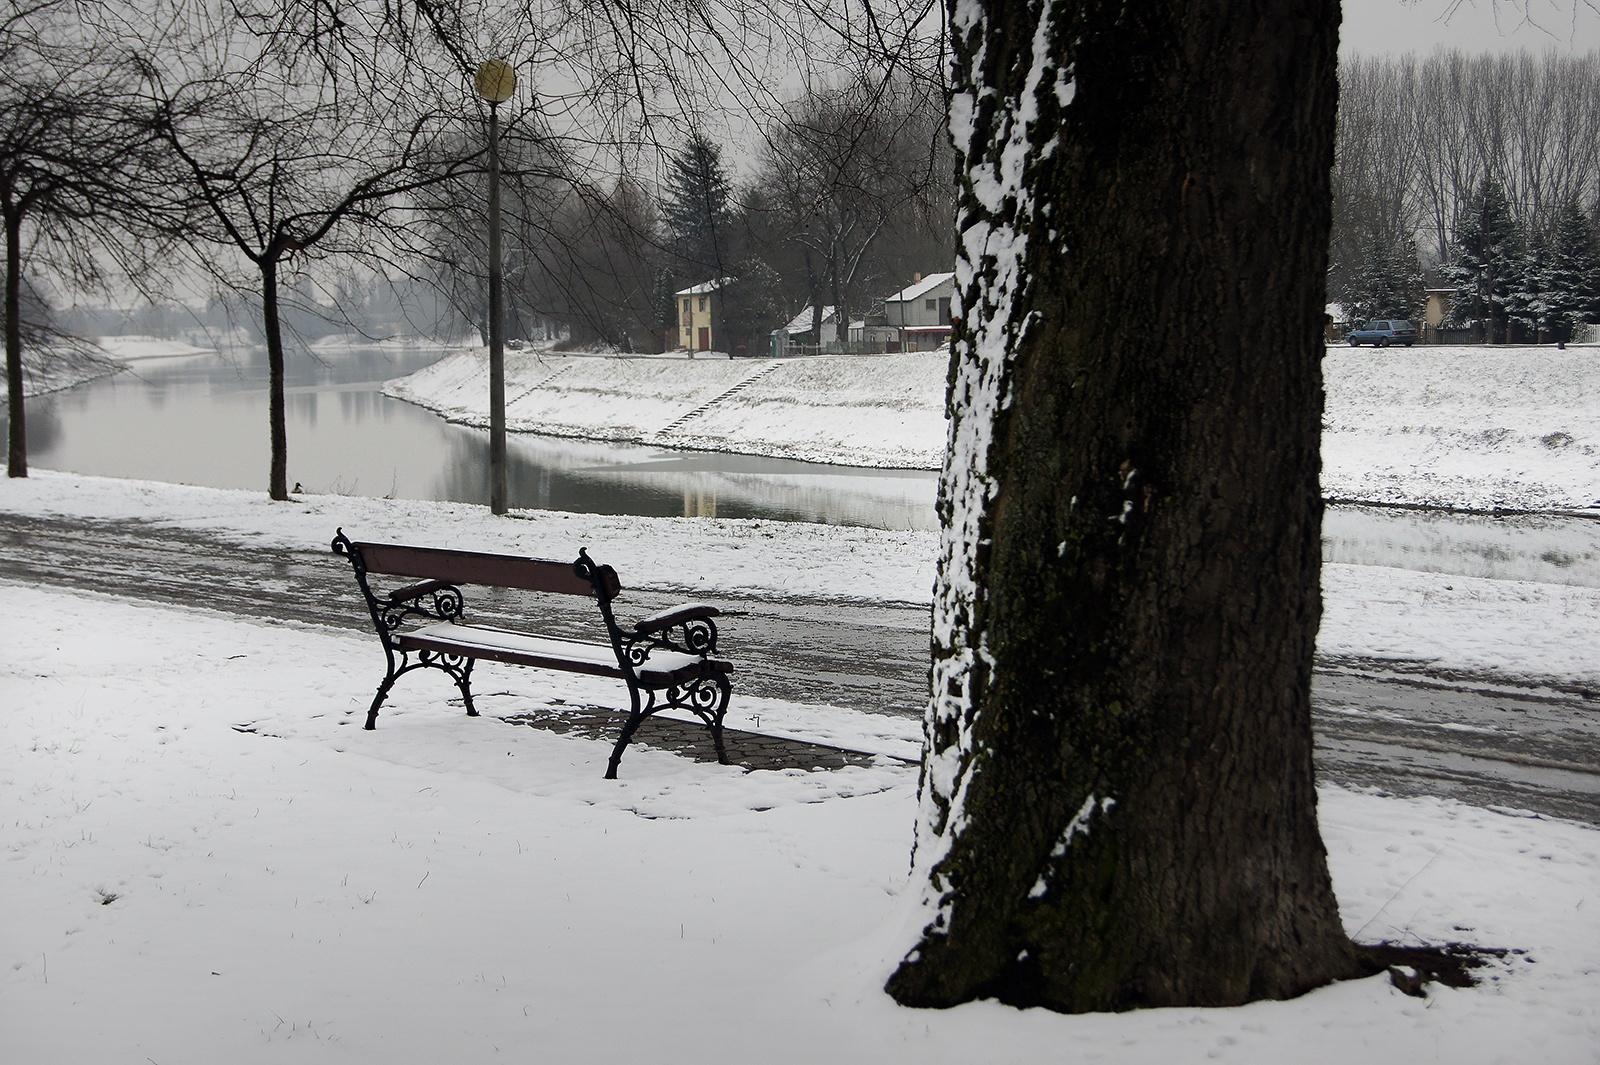 Téli nyugalom